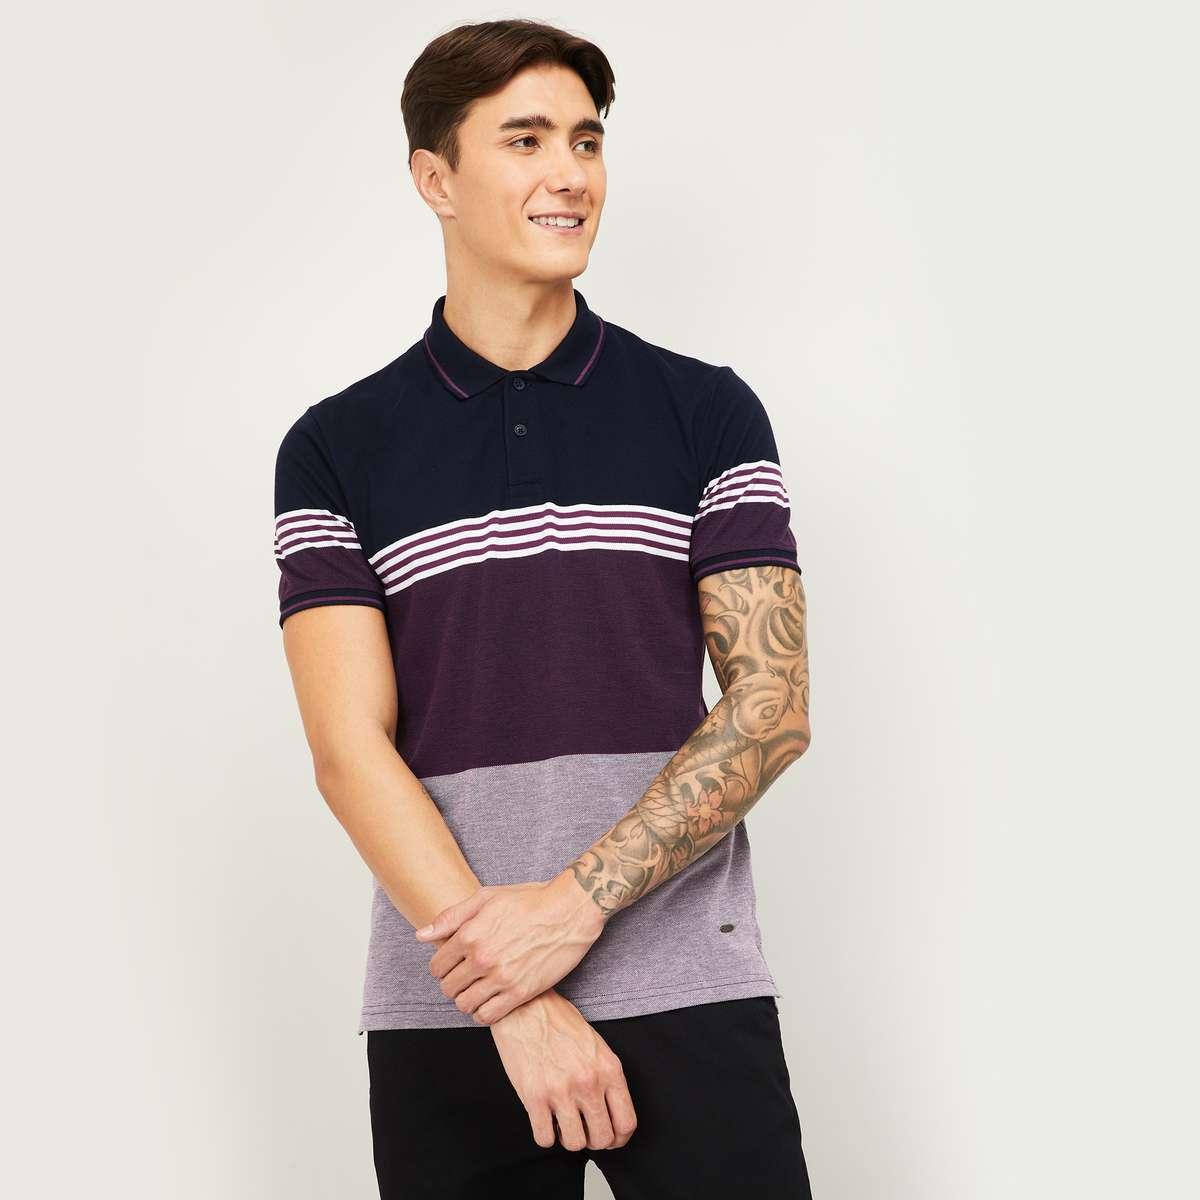 5.CODE Men Striped Regular Fit Polo T-shirt